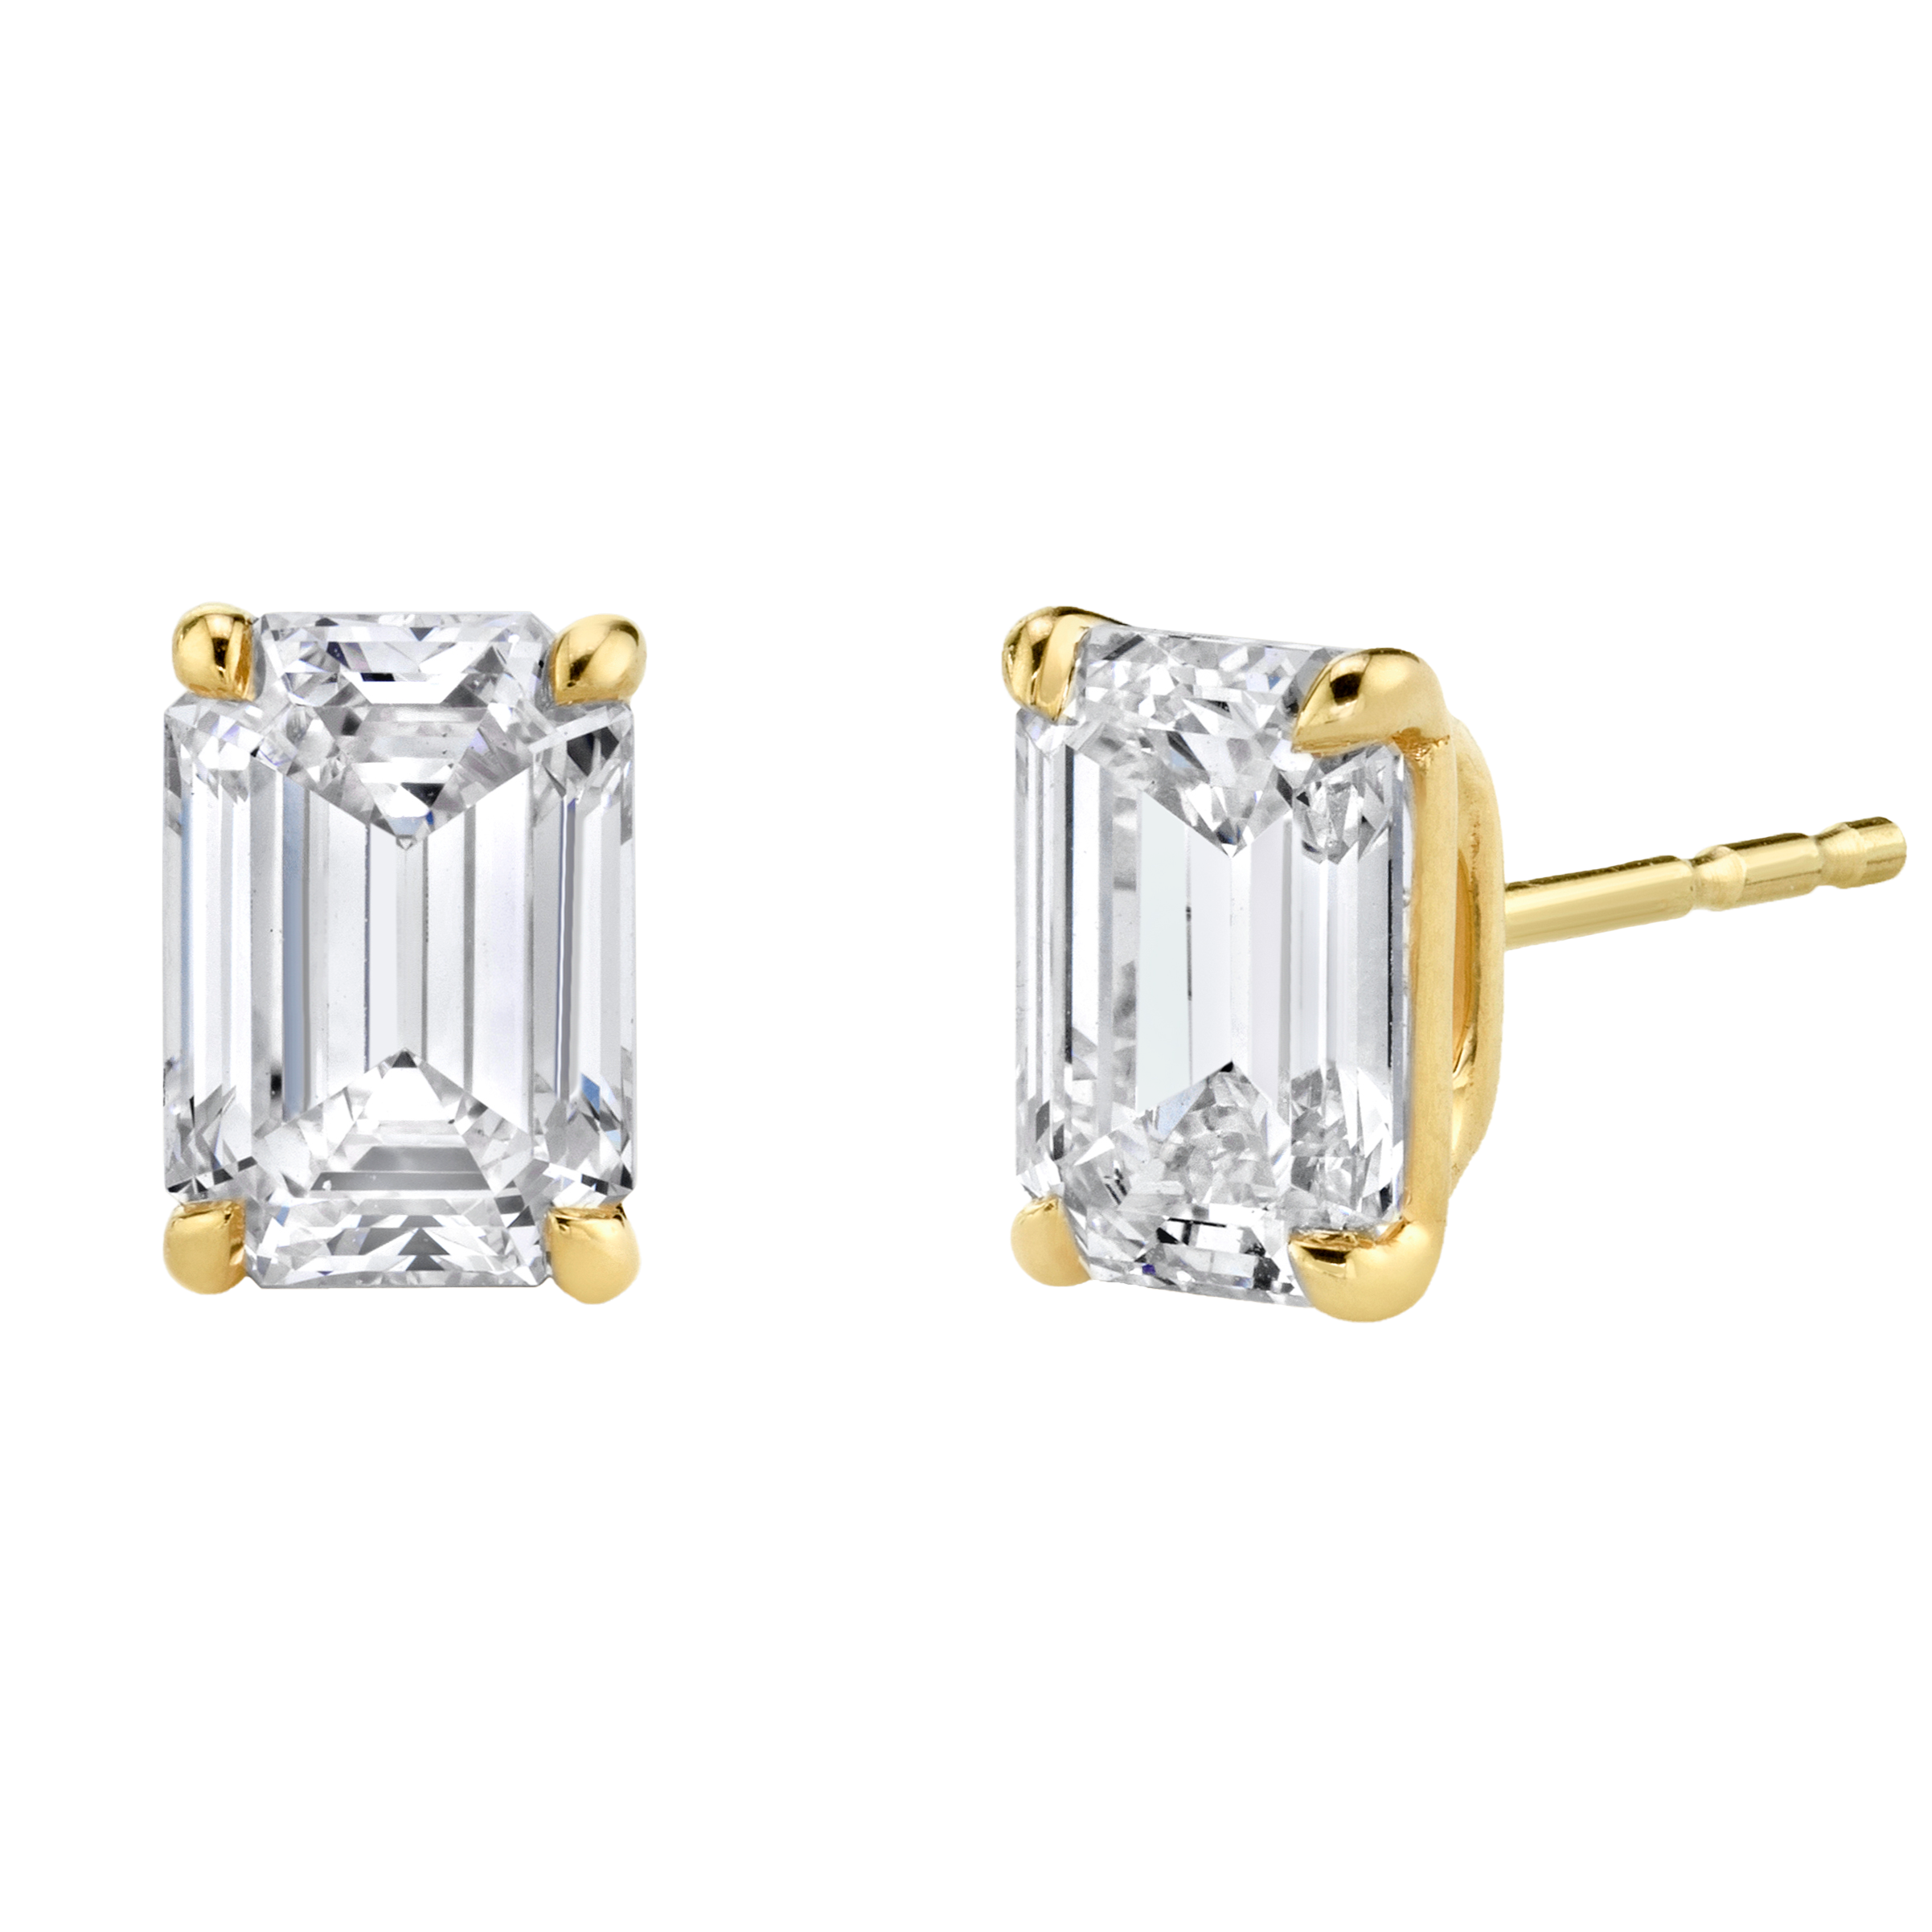 Solitaire Emerald Diamond Studs